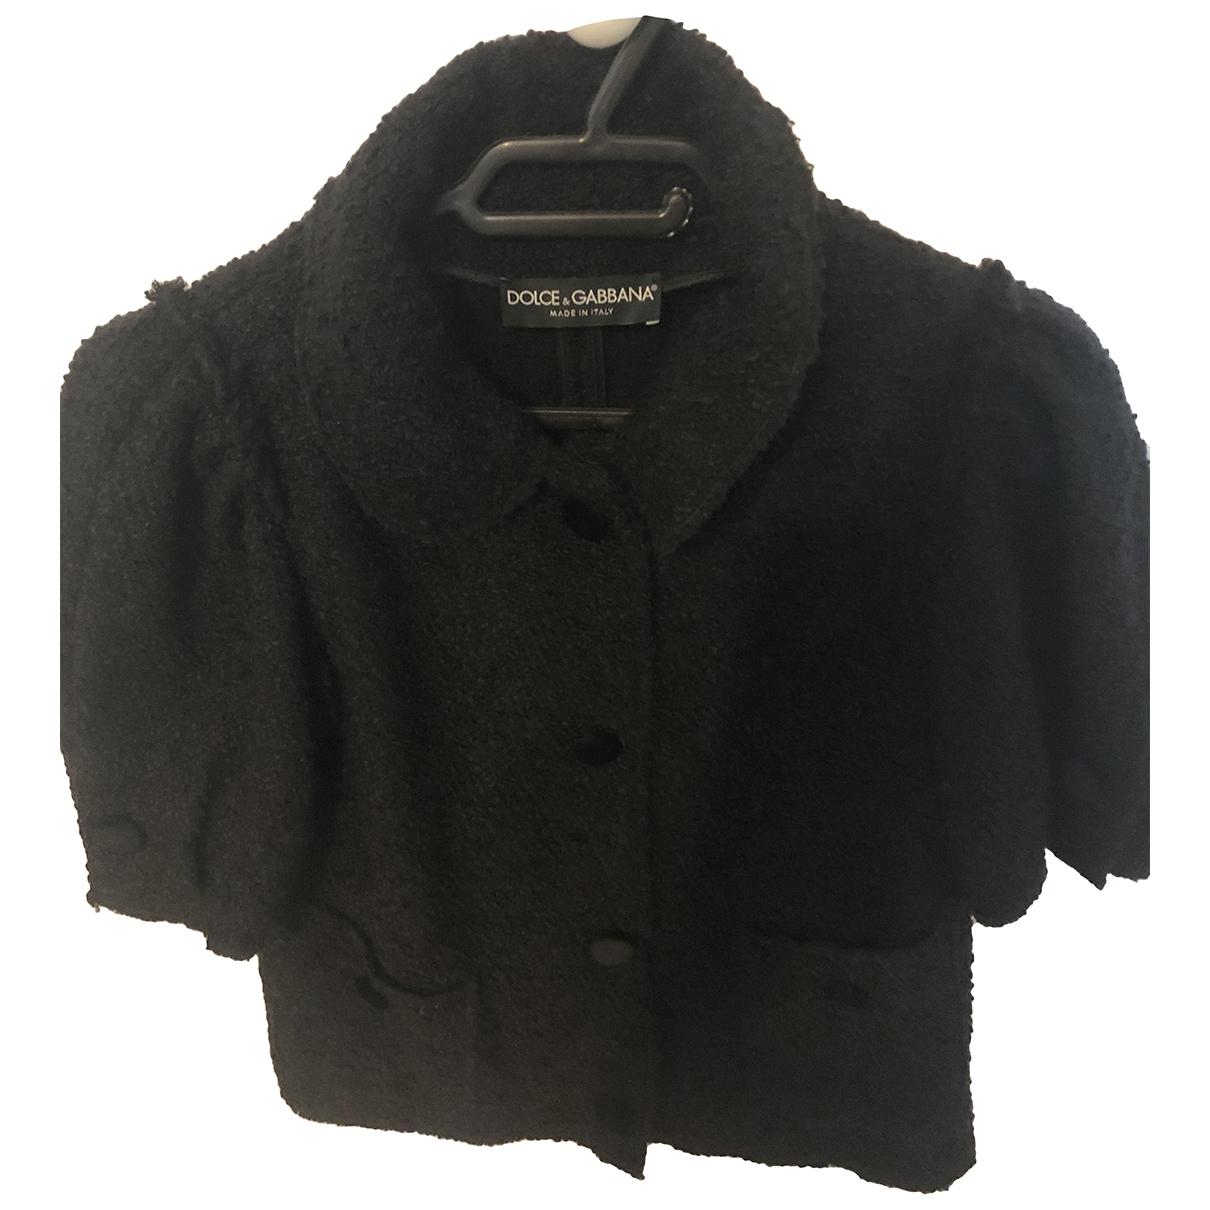 Dolce & Gabbana \N Black Wool jacket for Women 38 FR